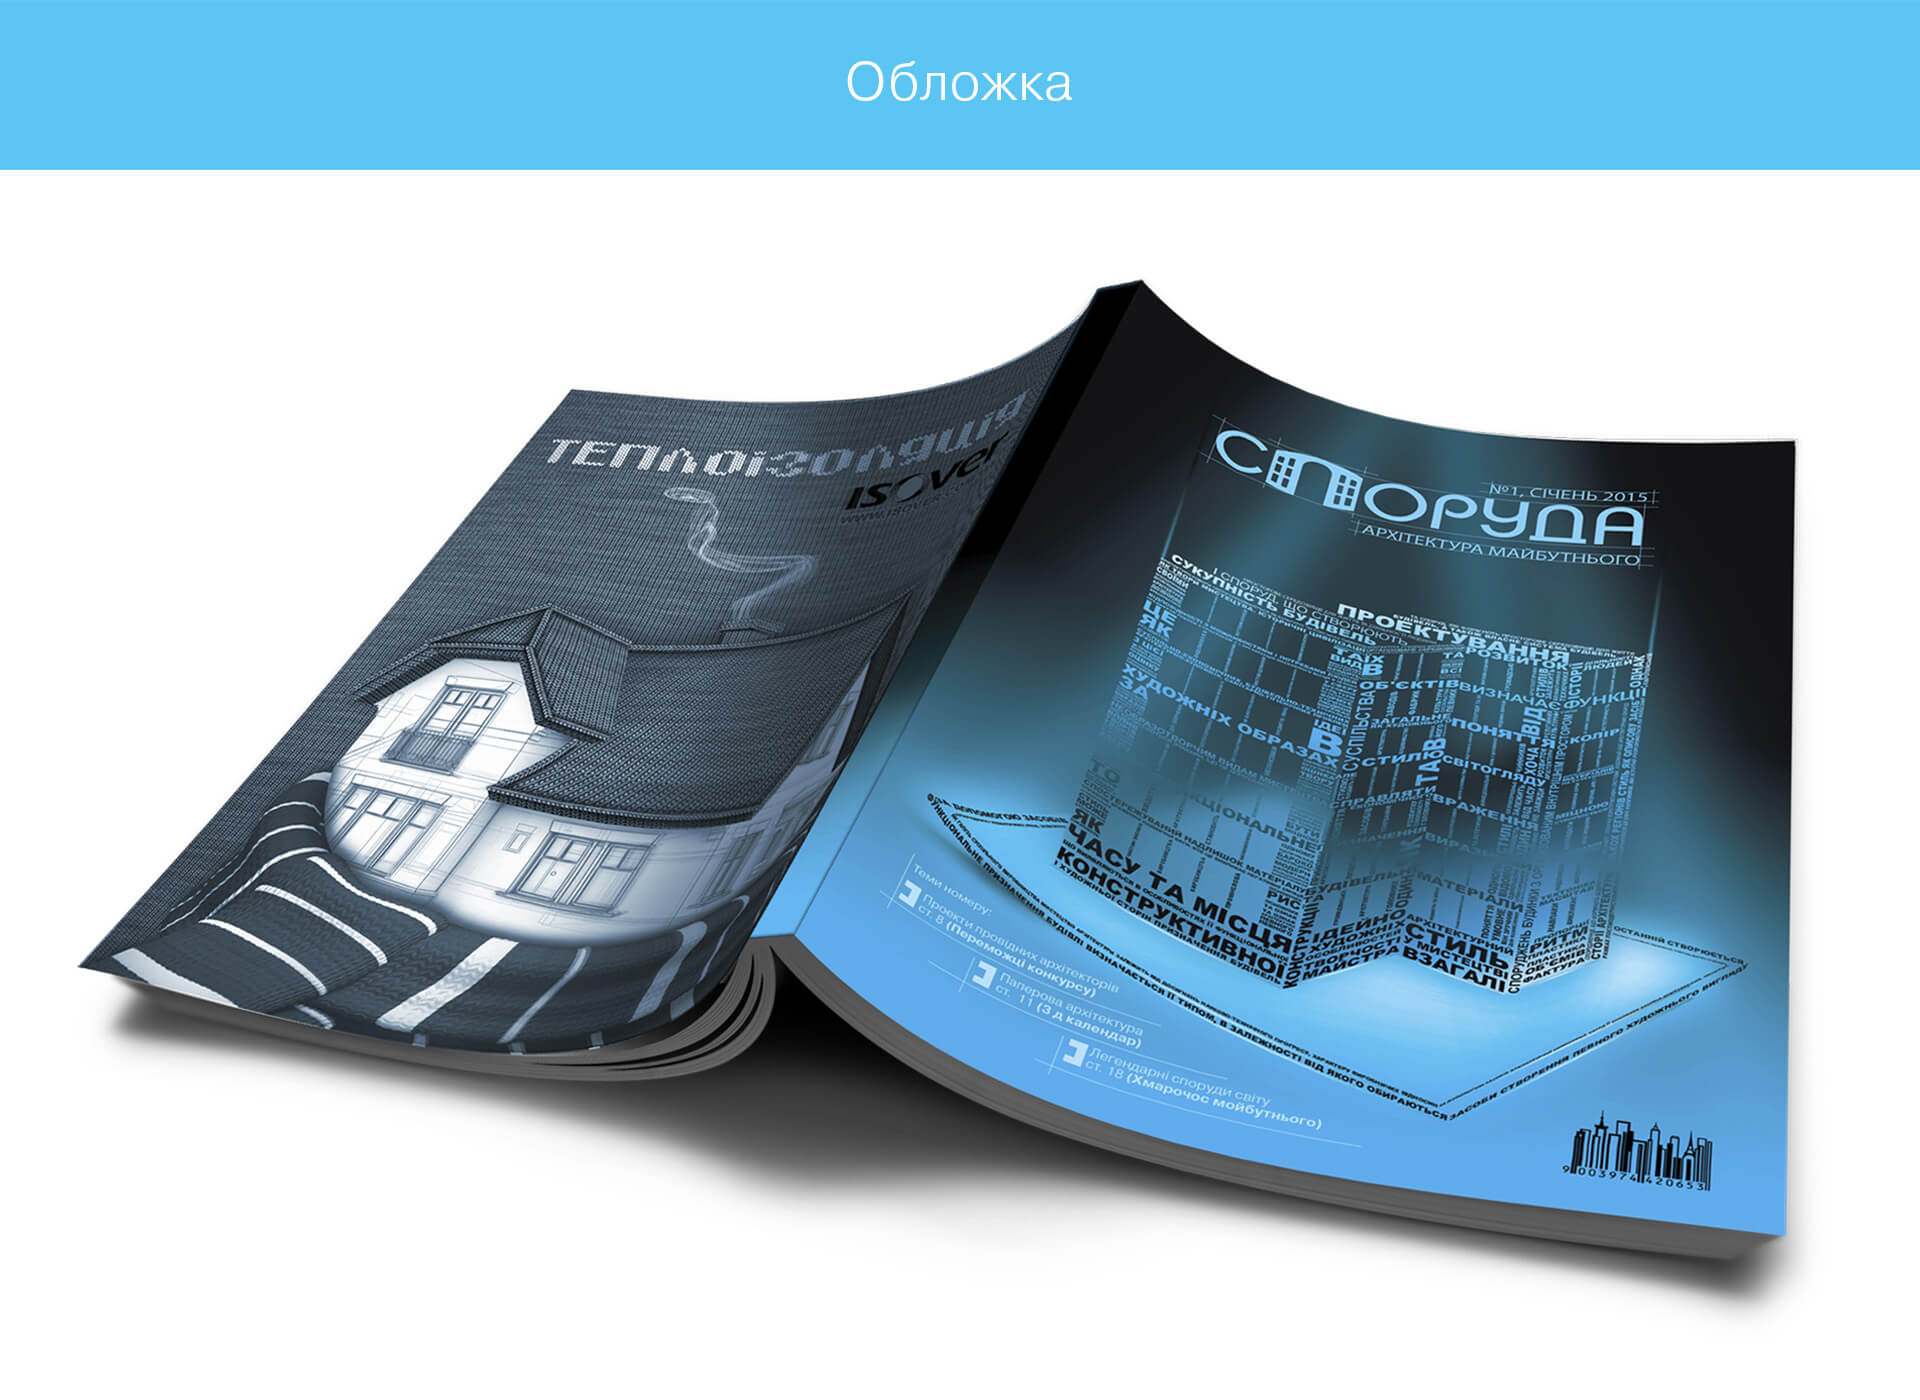 Prokochuk_Irina_architectural magazine Sporuda_2